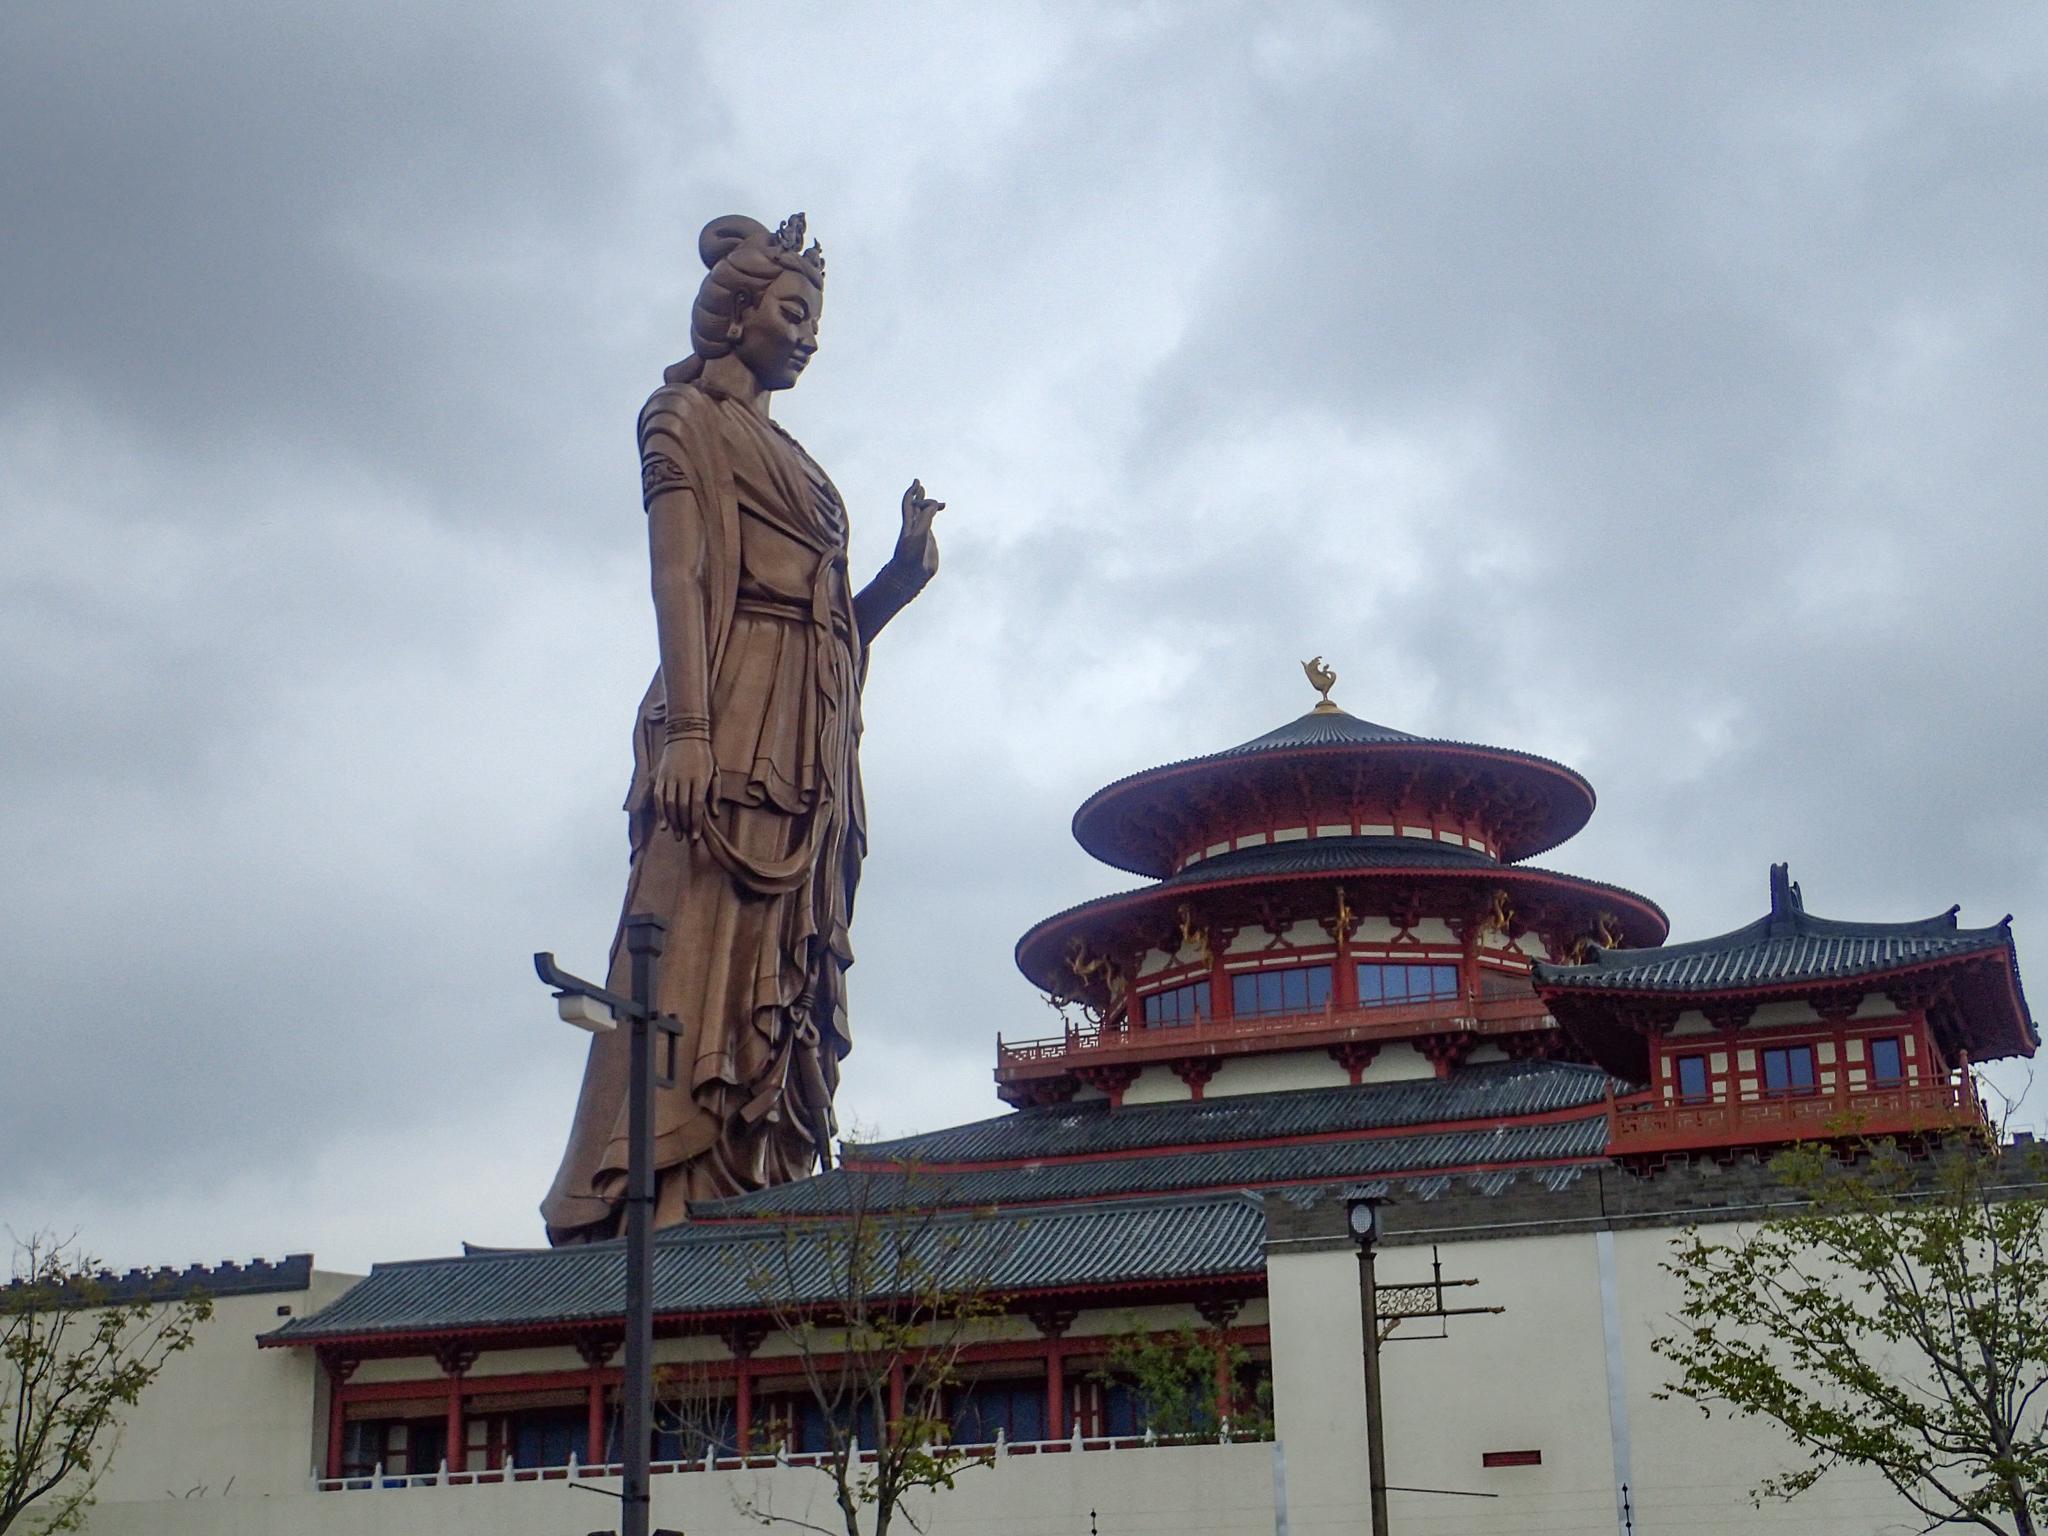 Massive statue in Shanghai